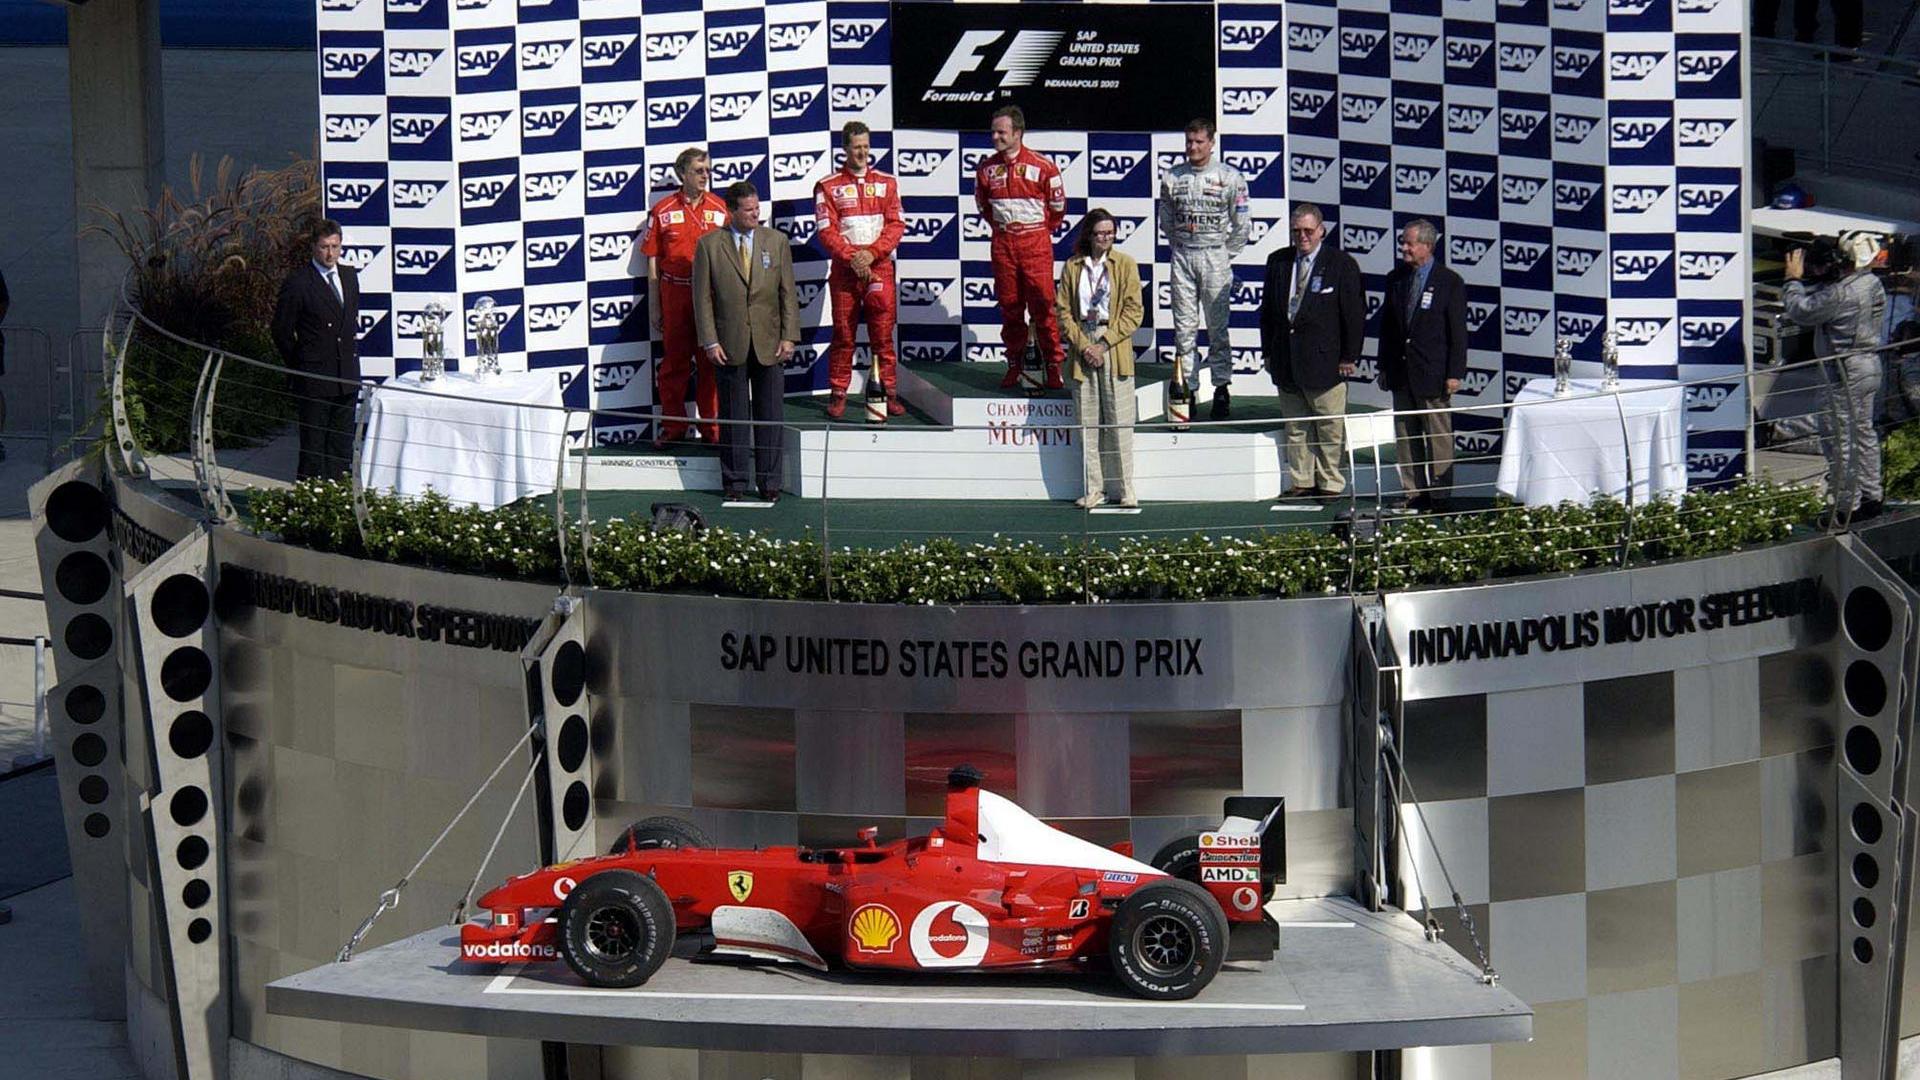 HD Wallpapers 2002 Formula 1 Grand Prix of USA